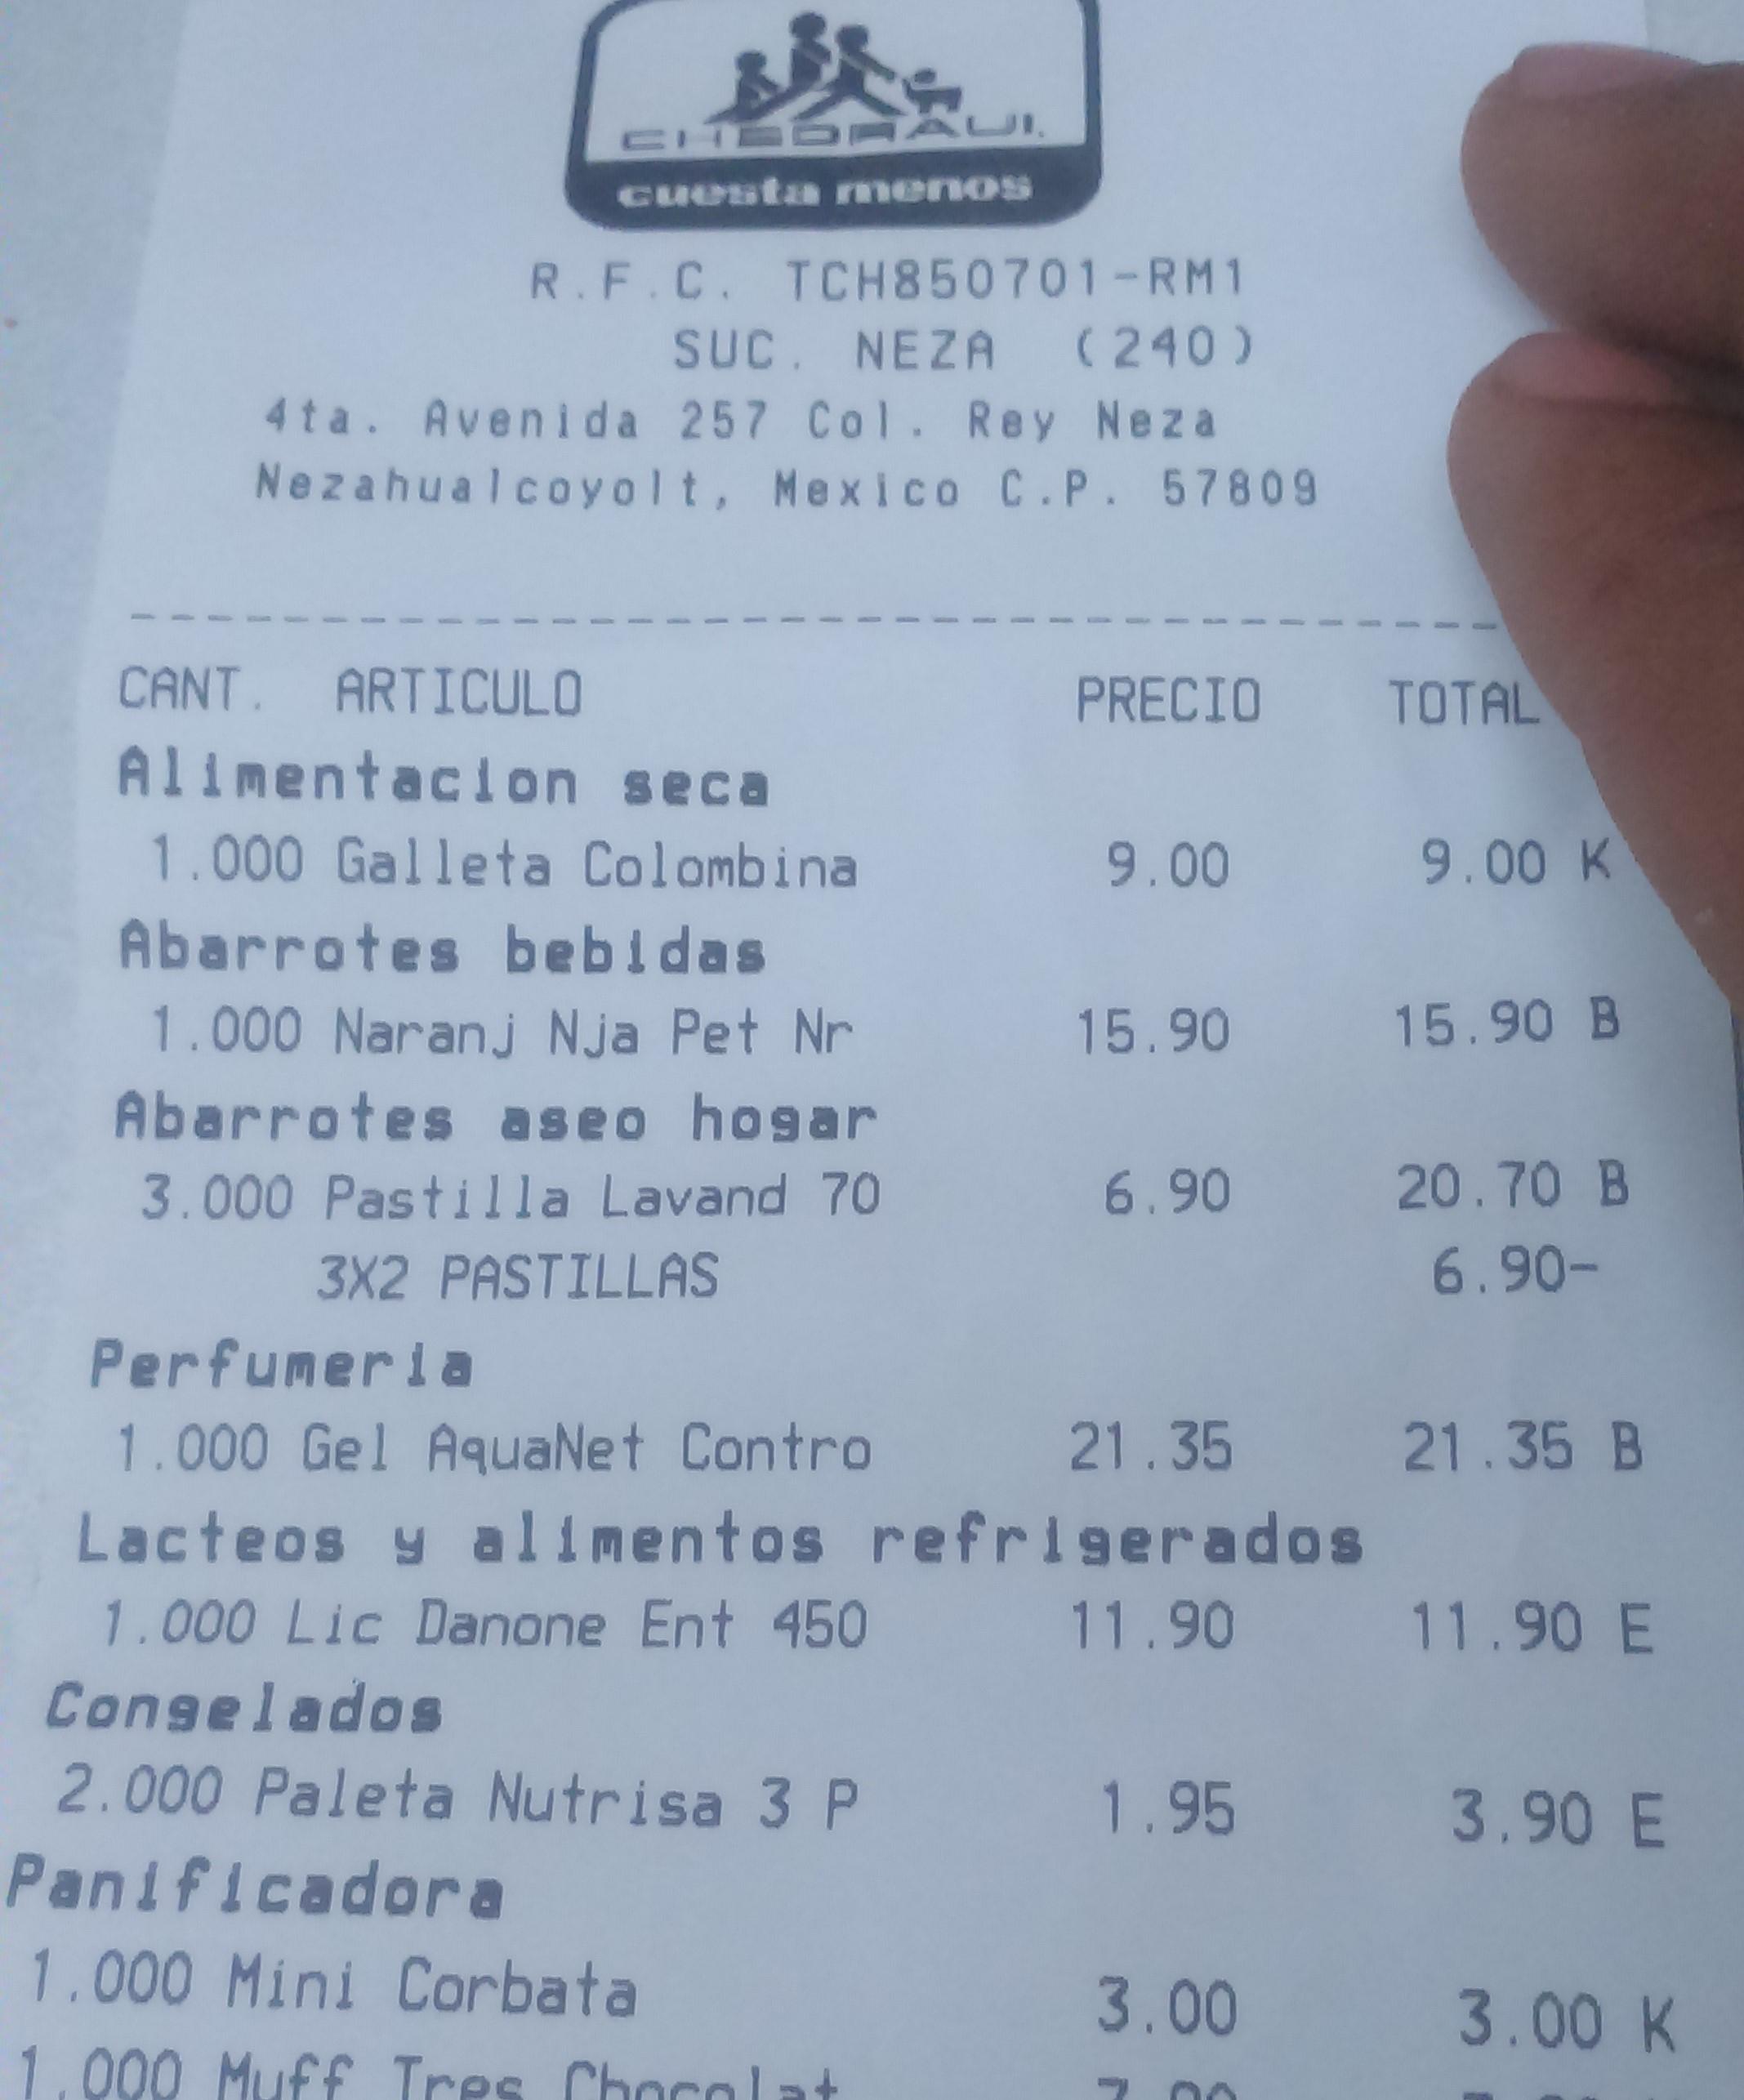 Chedraui Neza: Paletas de Yogurt Nutrisa 3x$1.95